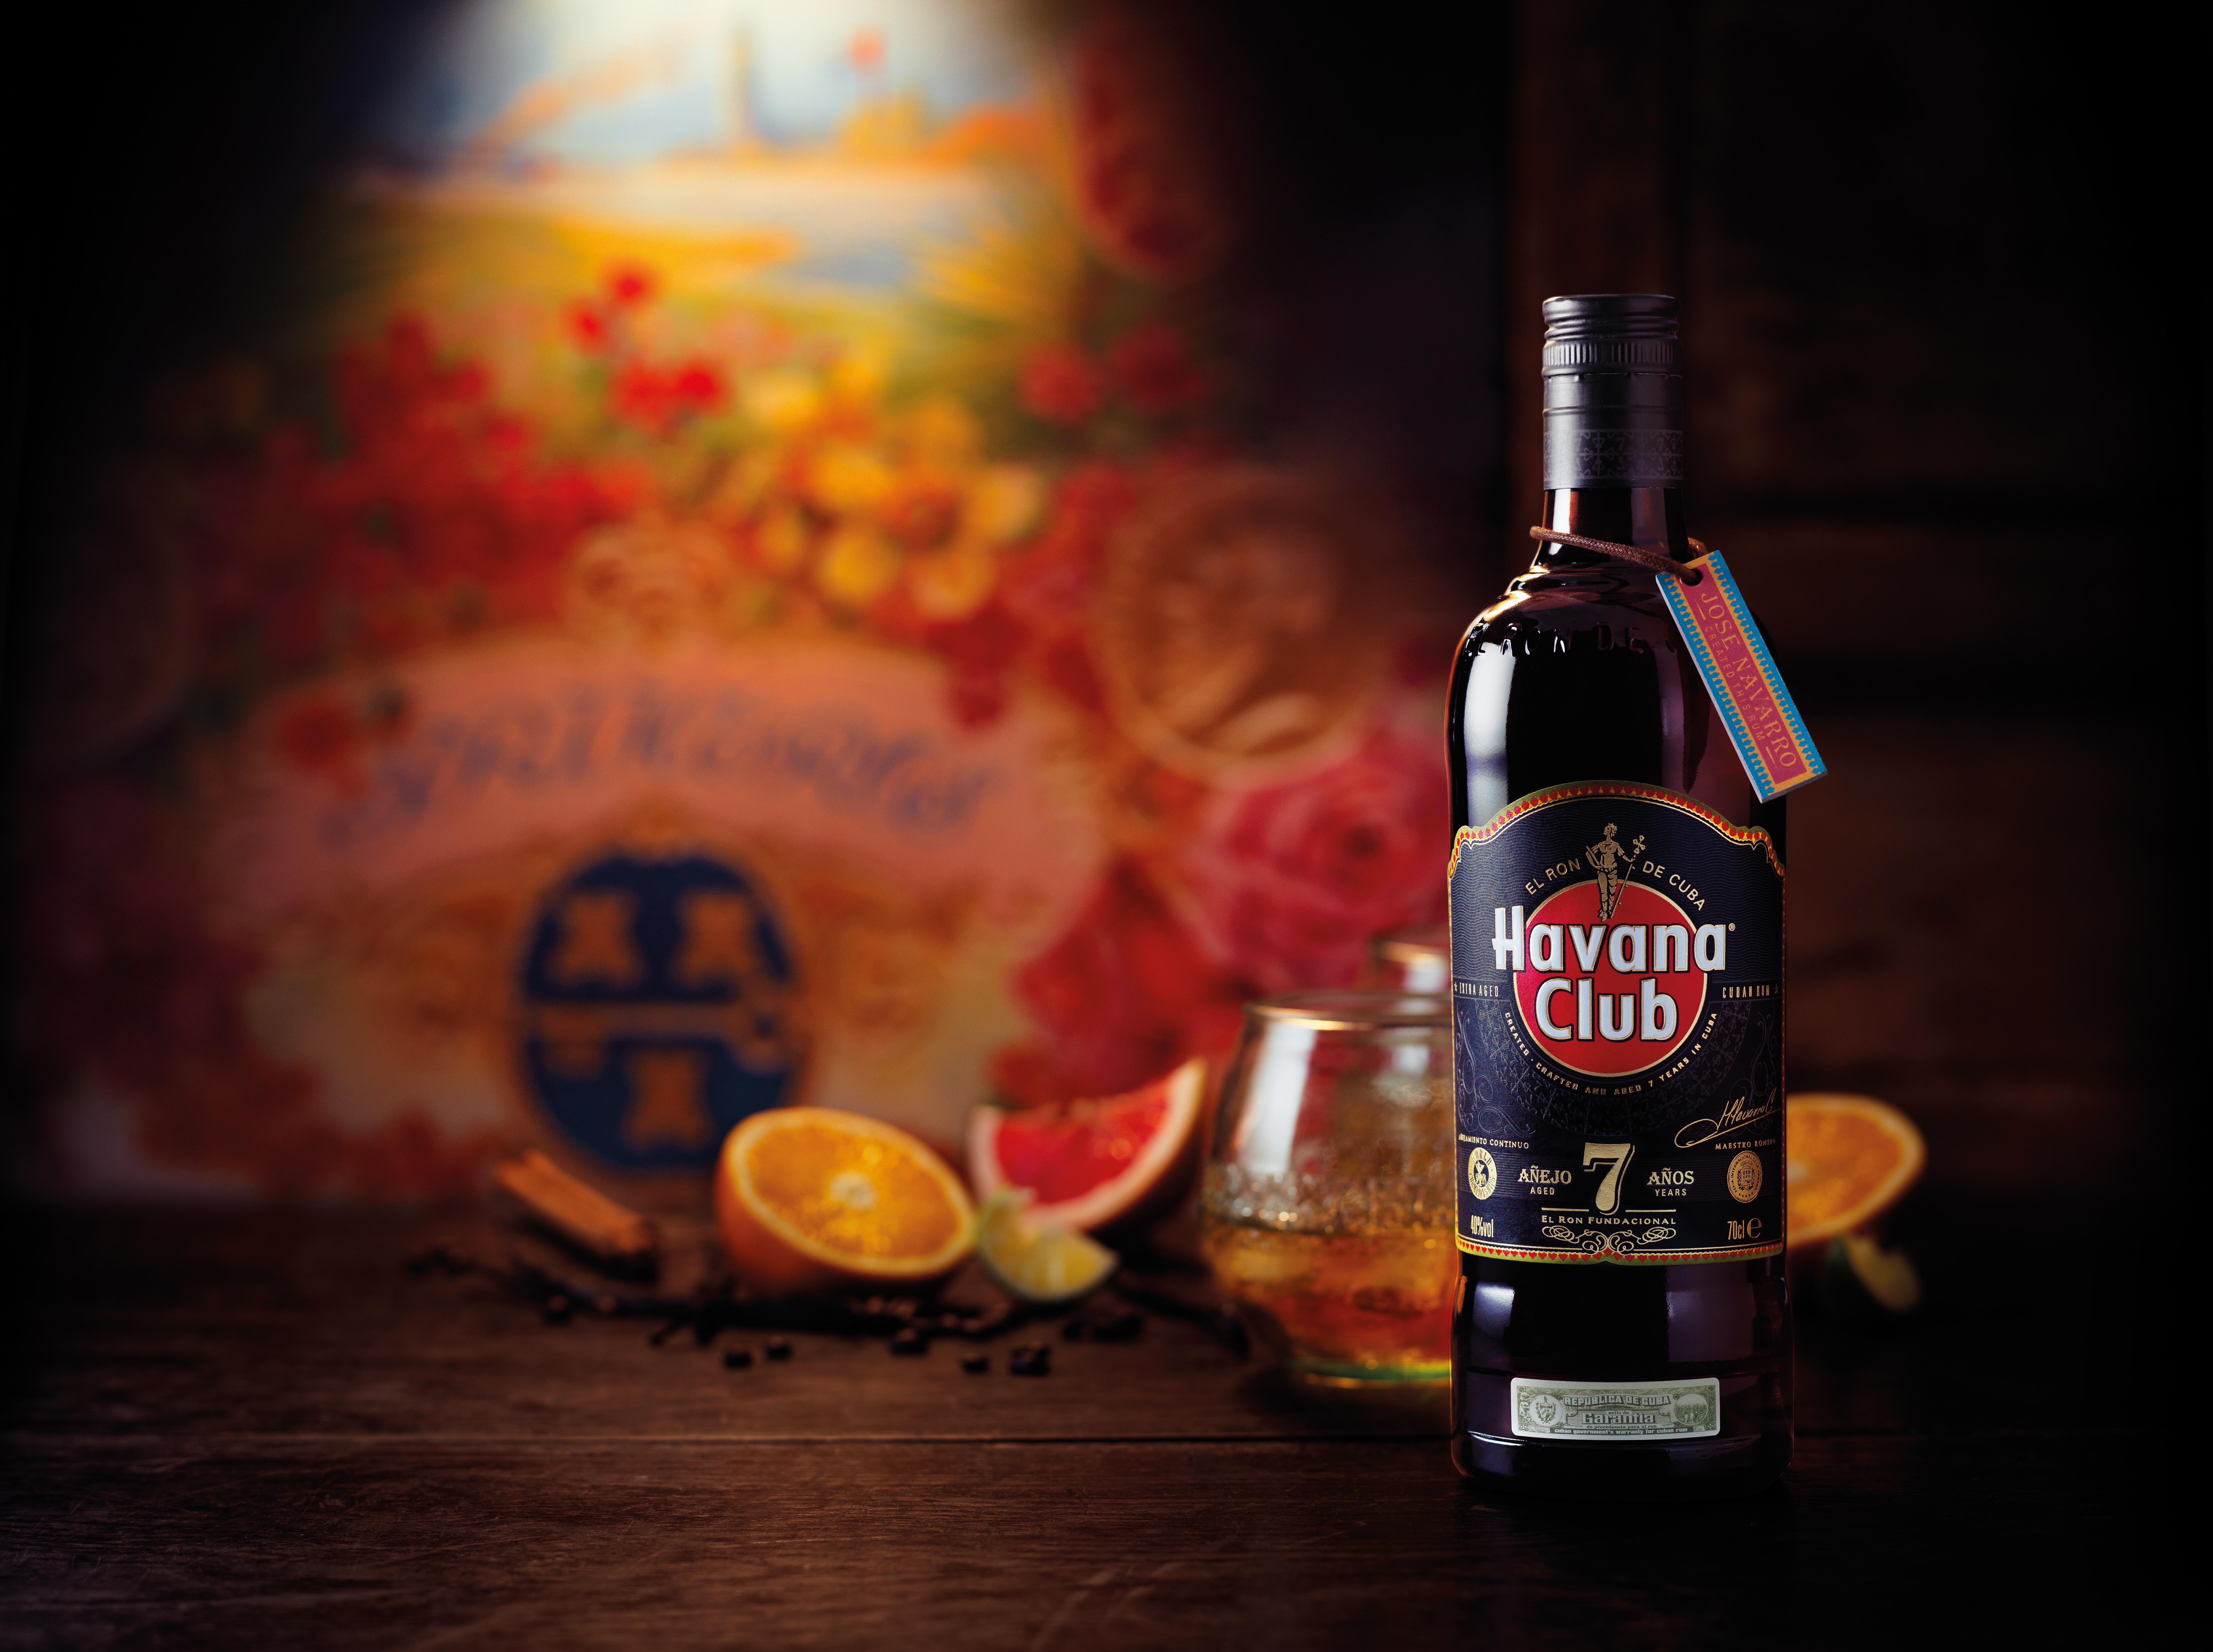 Havana Club_05